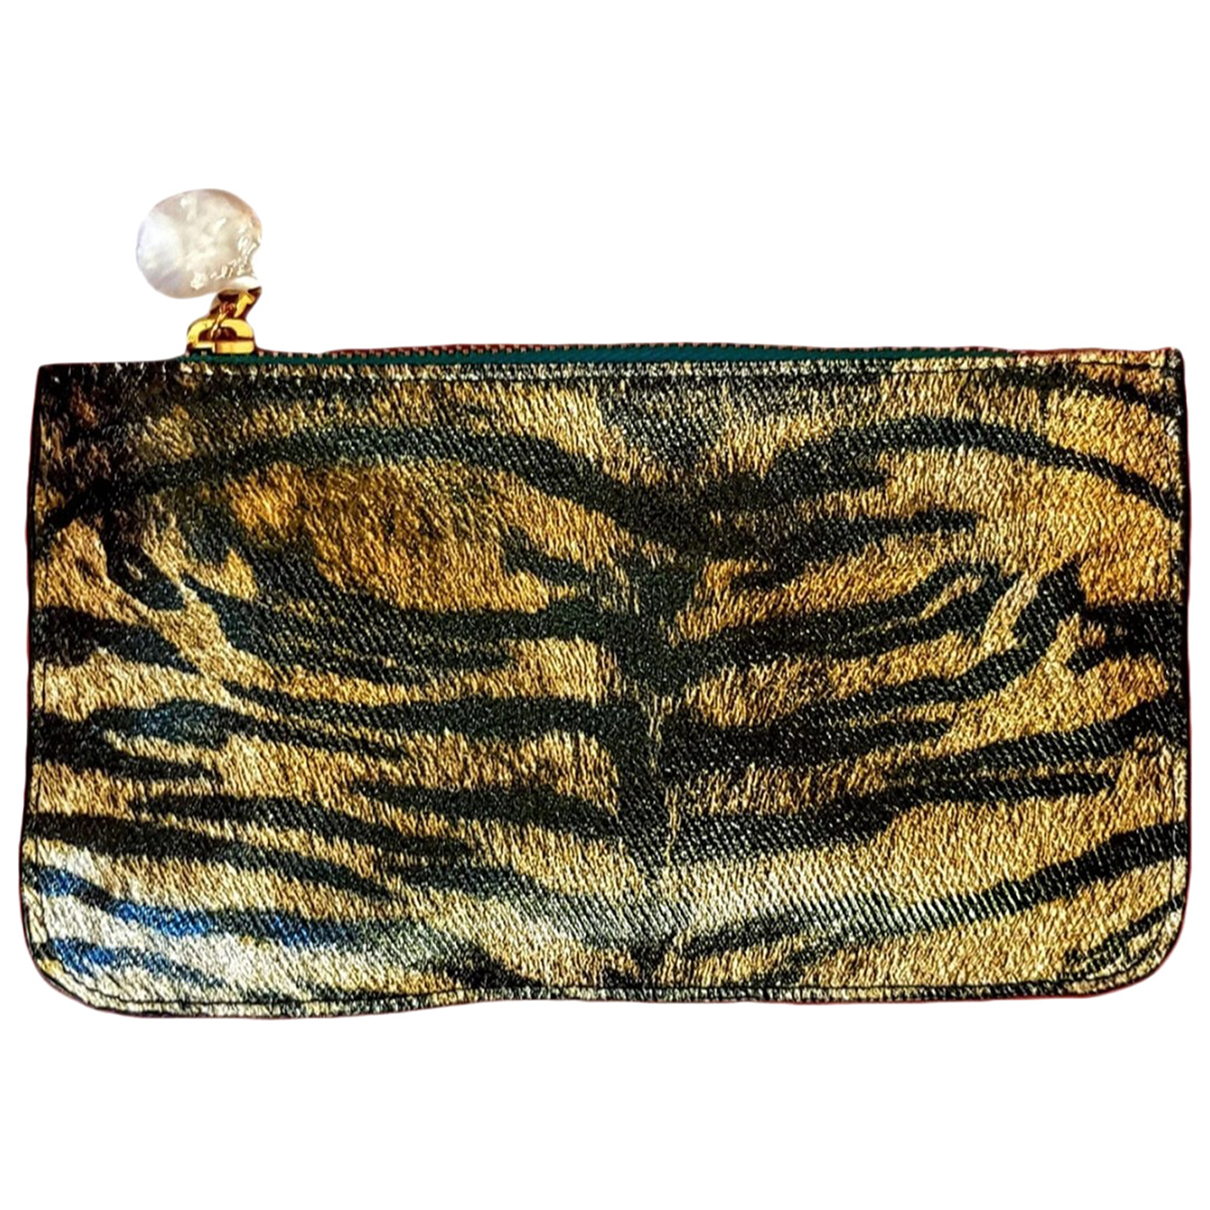 Roberto Cavalli N Multicolour Leather Clutch bag for Women N